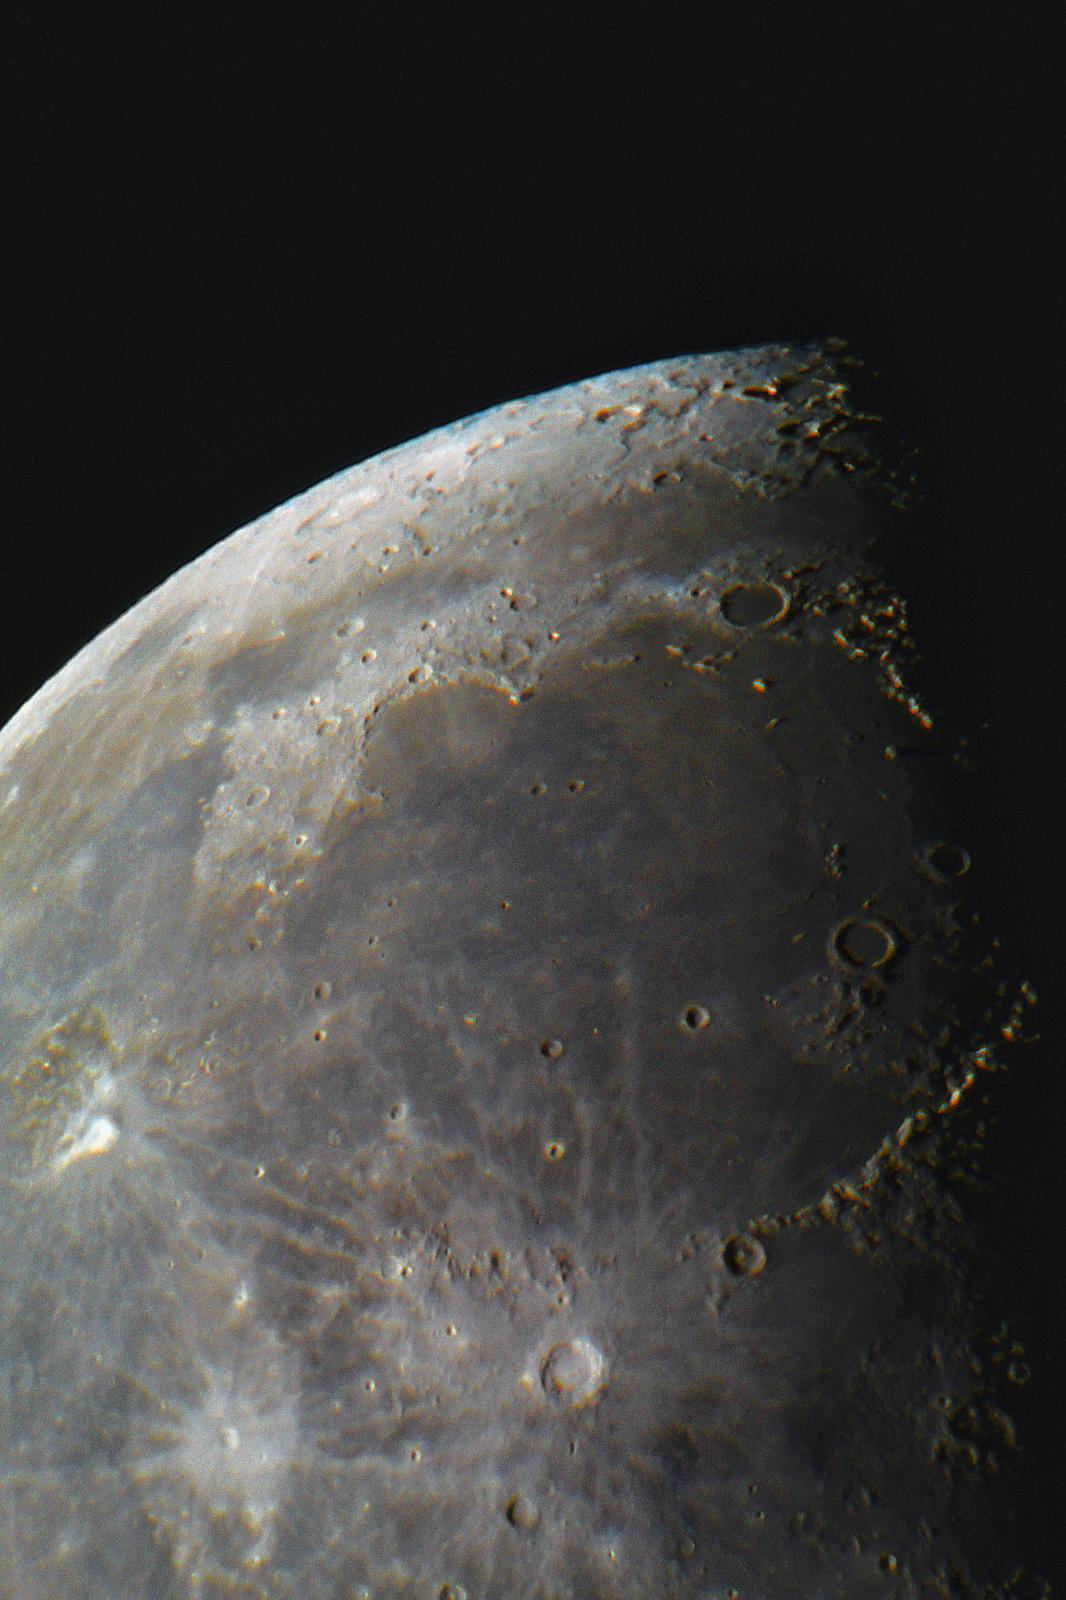 moon.thumb.jpg.d127d7e18849015a6592166492fbcb60.jpg